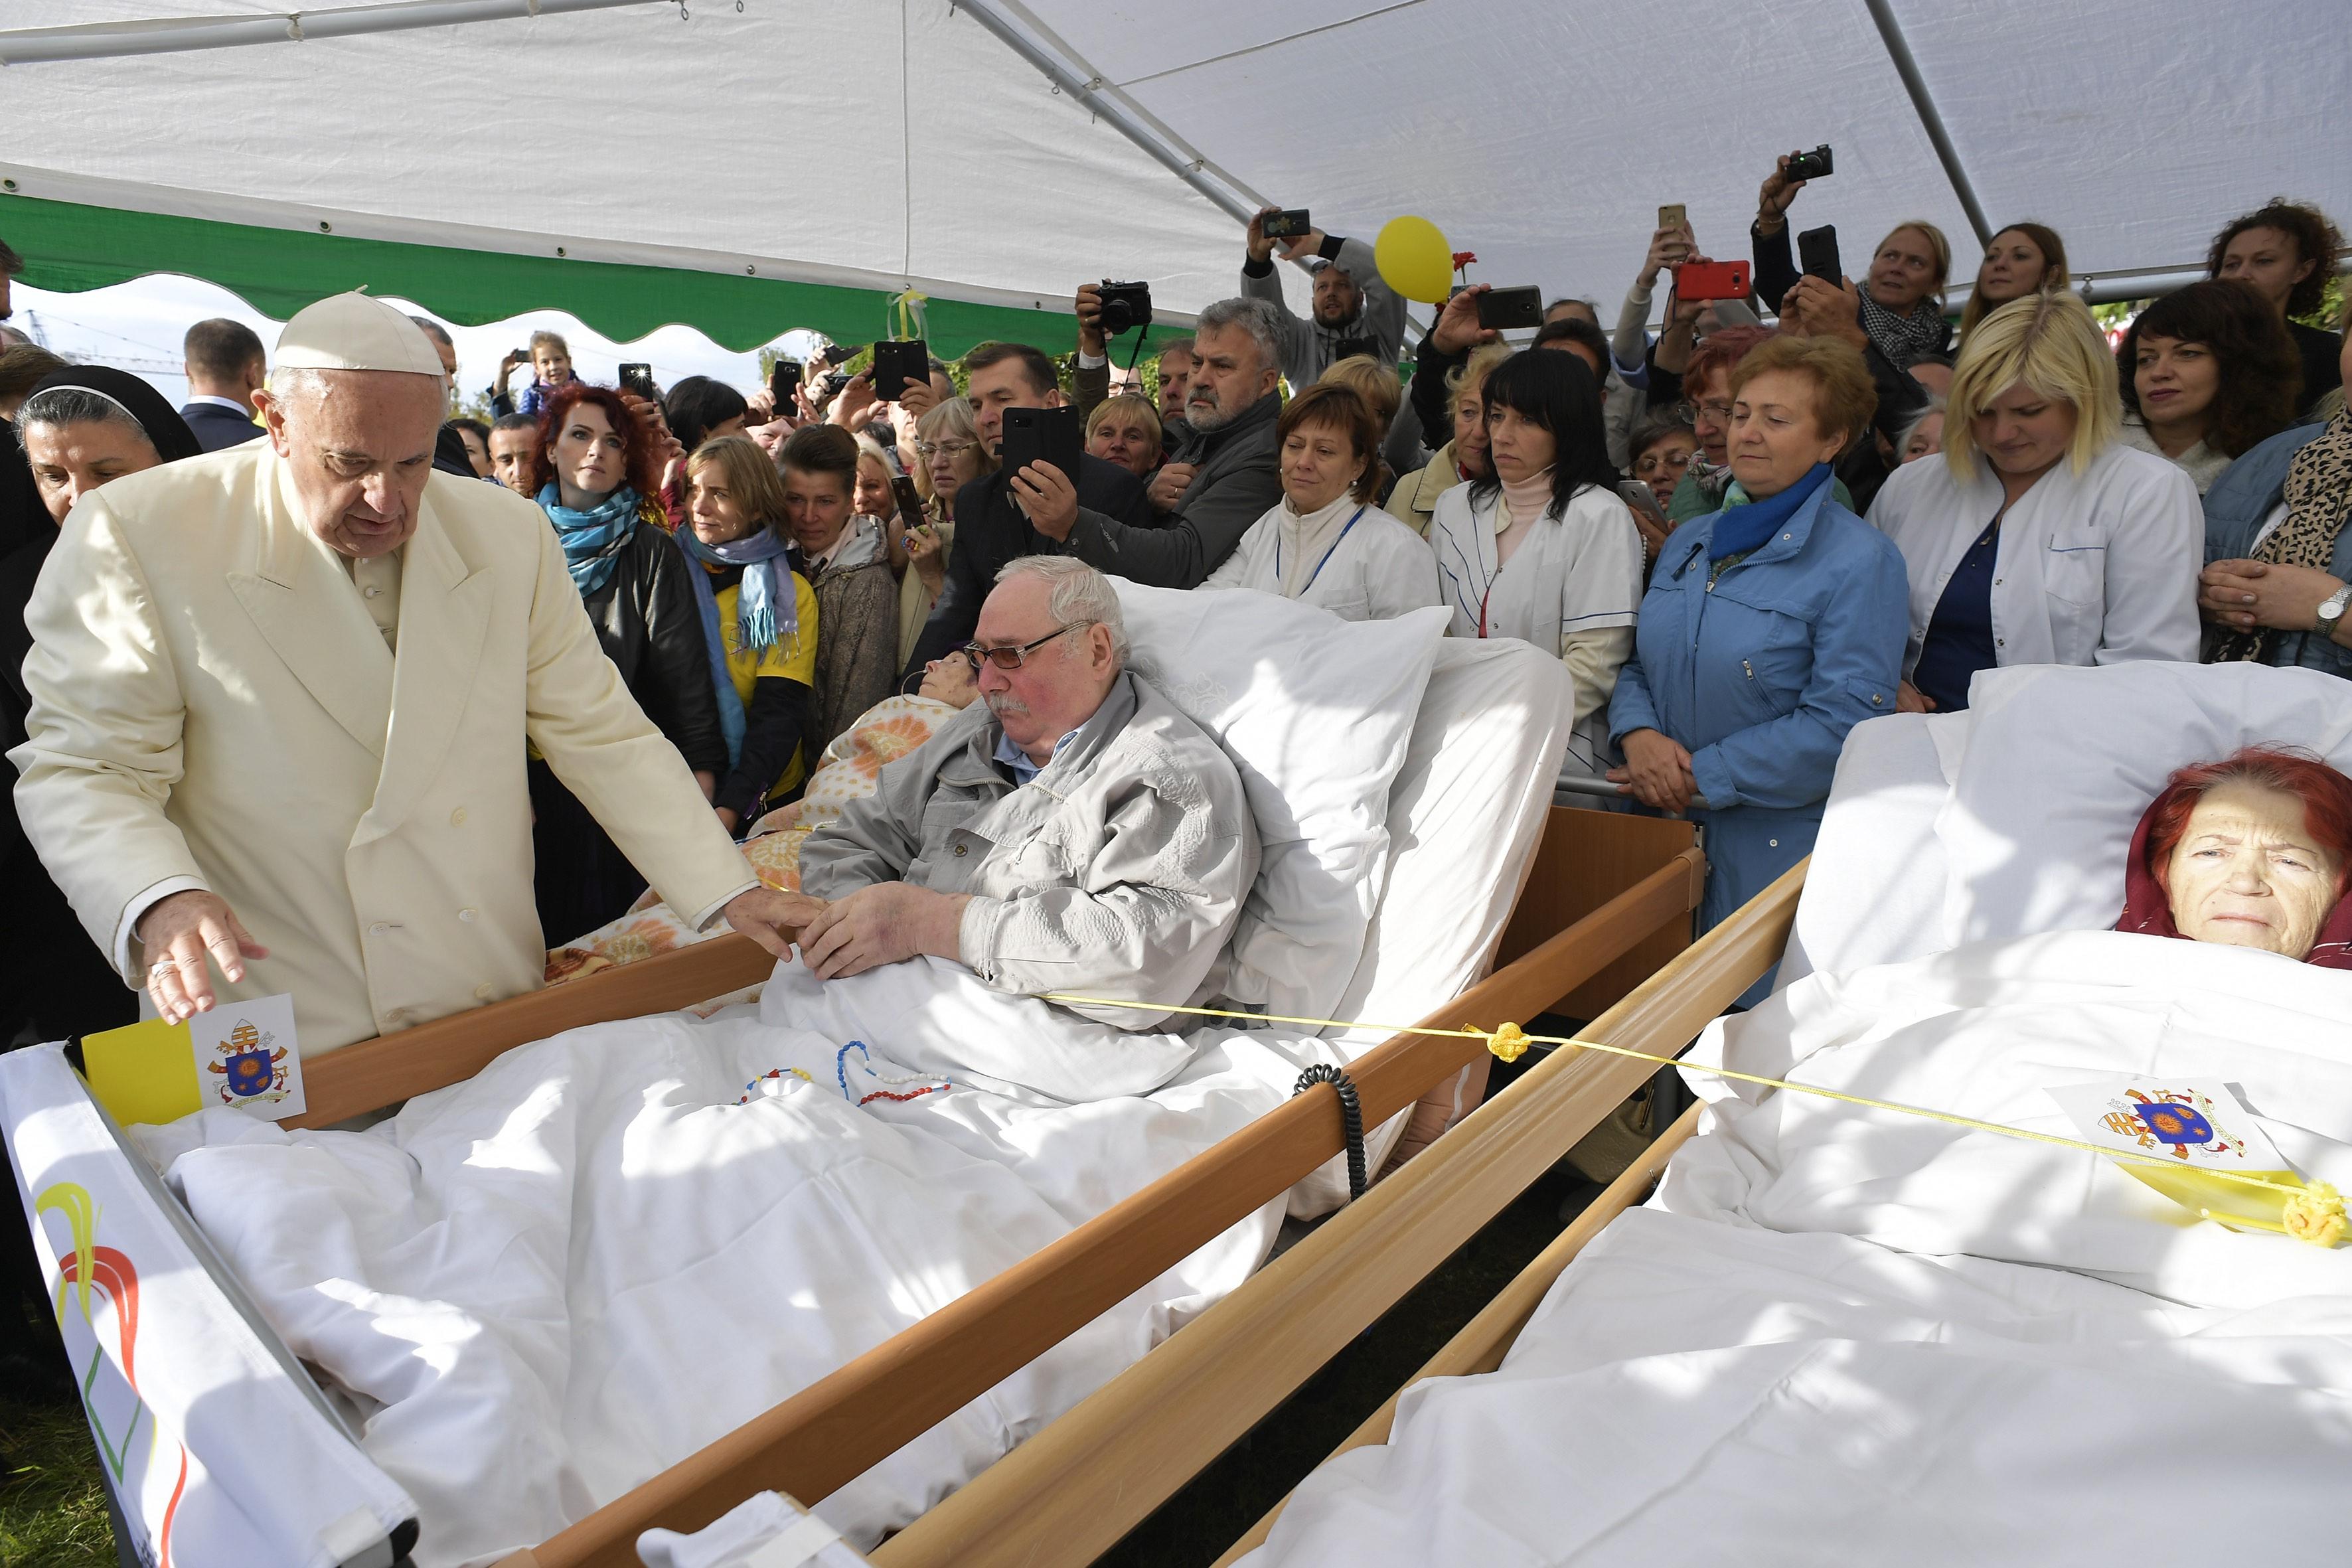 Rencontre avec les malades en soins palliatifs, Vilnius © Vatican Media